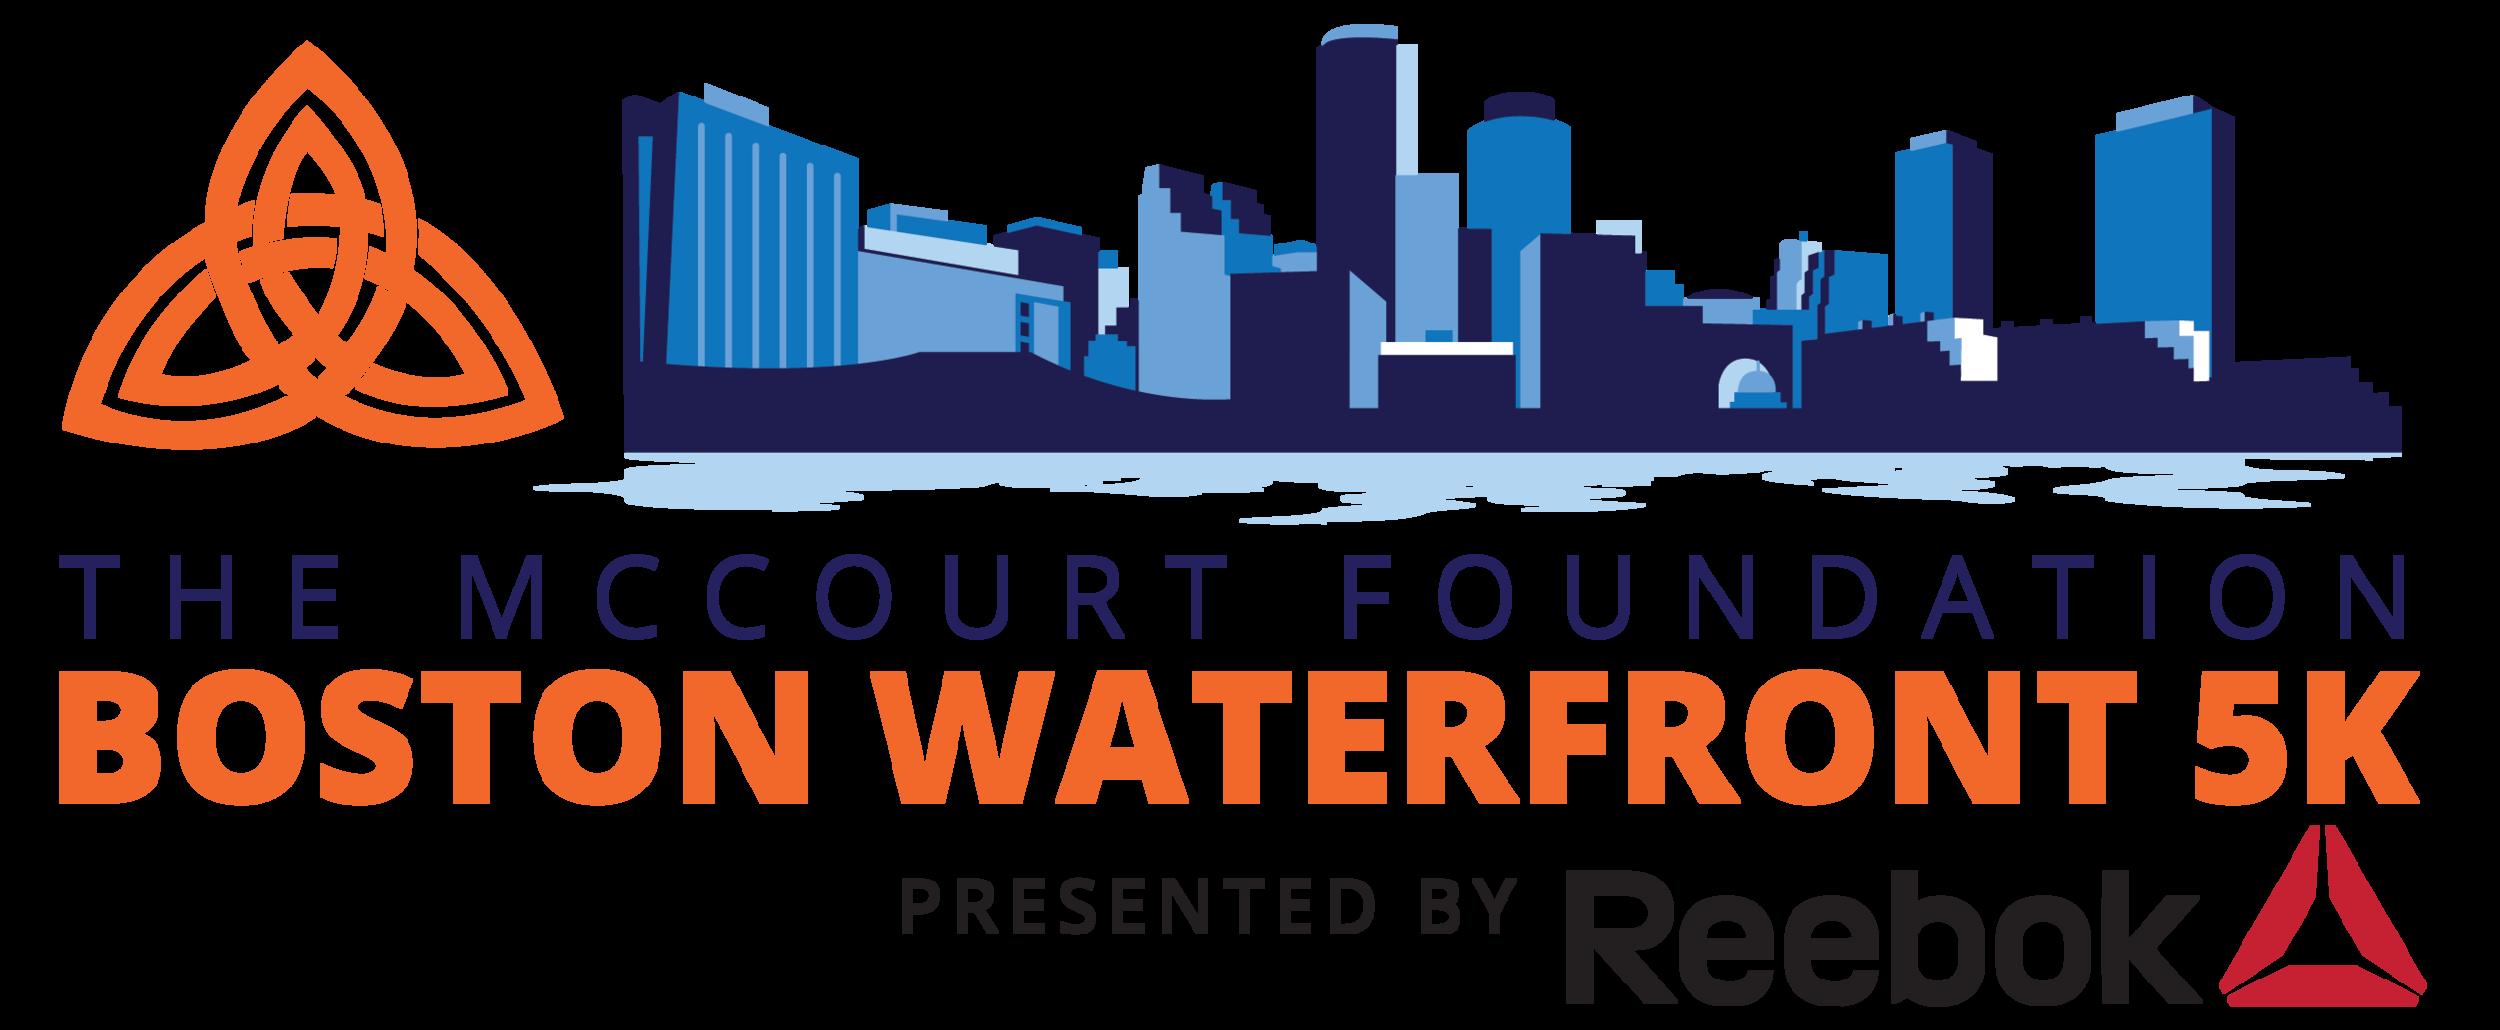 tmf-waterfront-5k-branding-ol-transparent-bg_Artboard 1.png